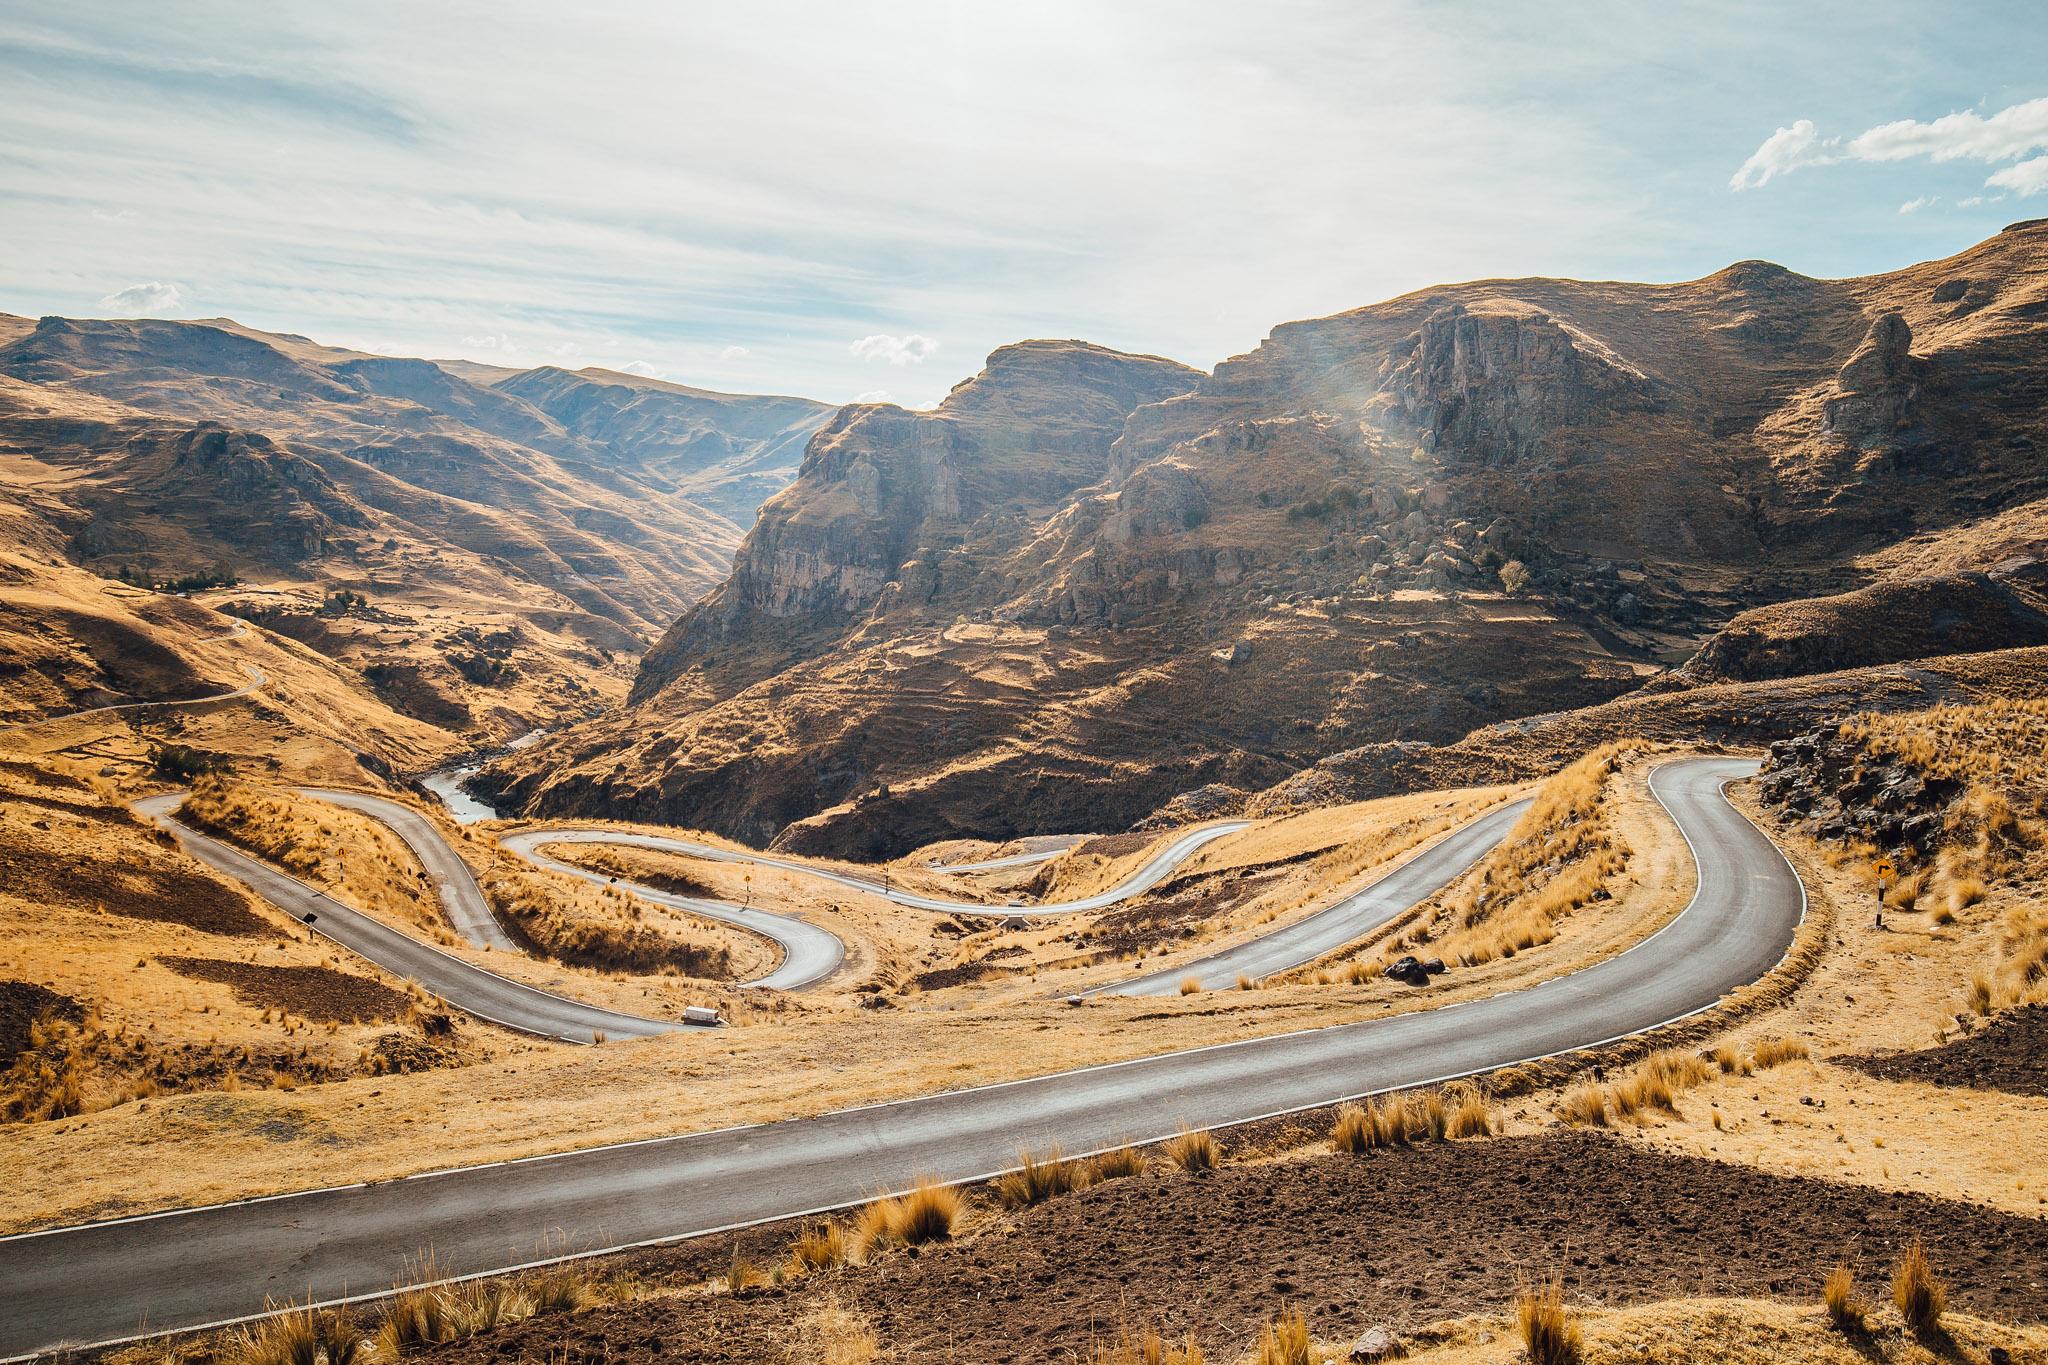 overlanding-apurimac-valley-peru-queswachaka-last-inca-bridge-2.jpg